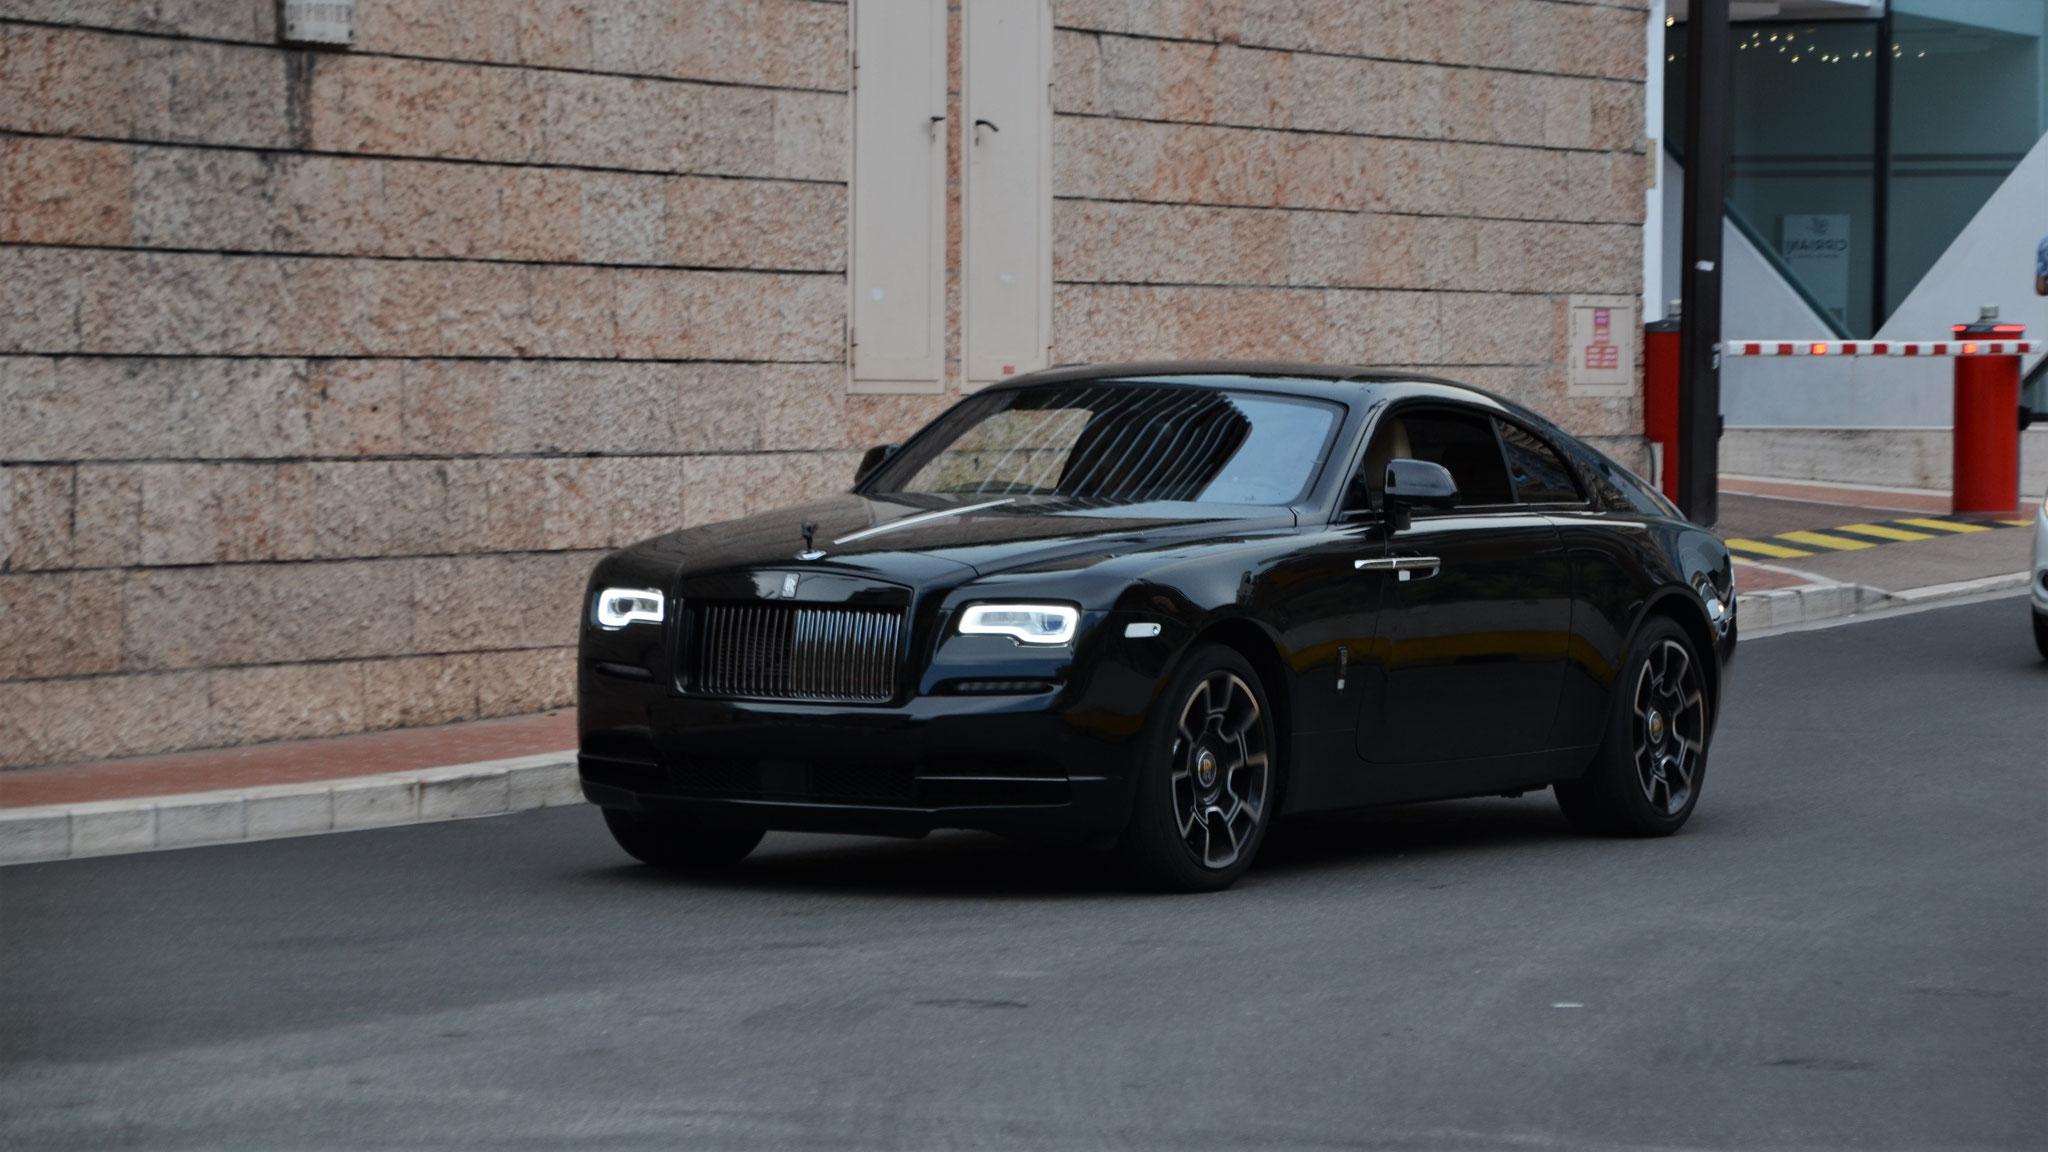 Rolls Royce Wraith - AA-7777-KK (UA)